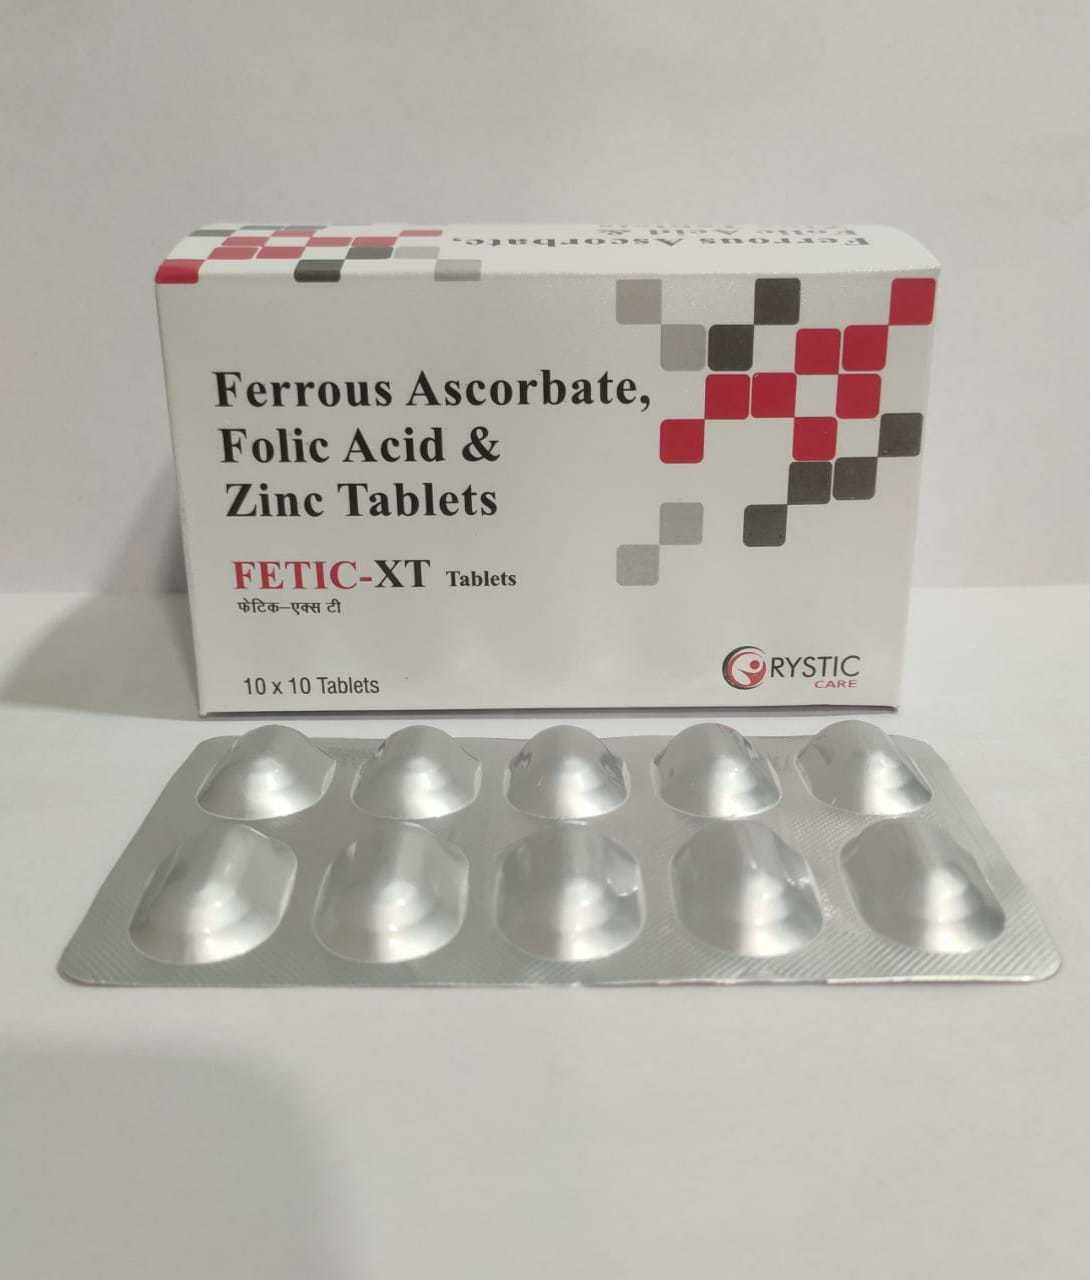 Ferrous Ascorbate, Folic Acid & Zinc Tablets